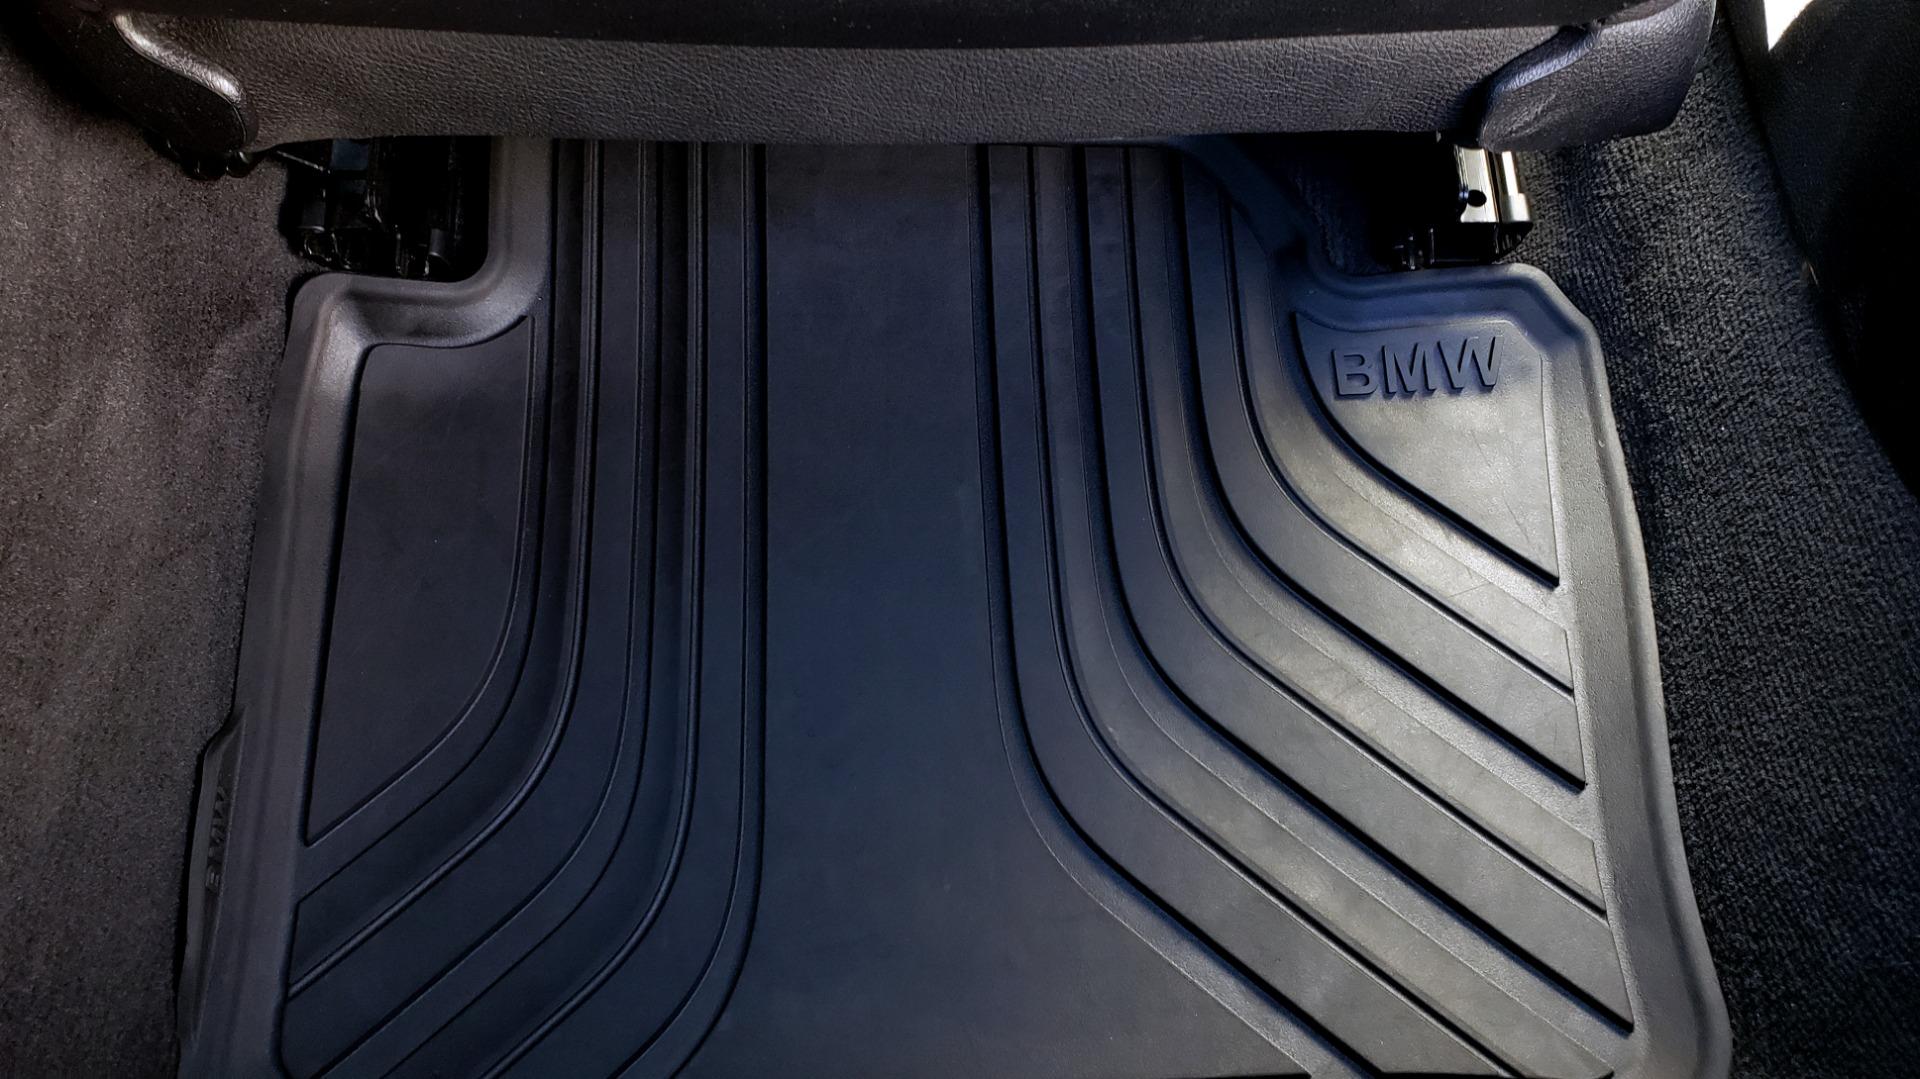 Used 2018 BMW 4 SERIES 430IXDRIVE / PREMIUM / NAV / SUNROOF / ESSENTIALS PKG for sale $29,495 at Formula Imports in Charlotte NC 28227 75